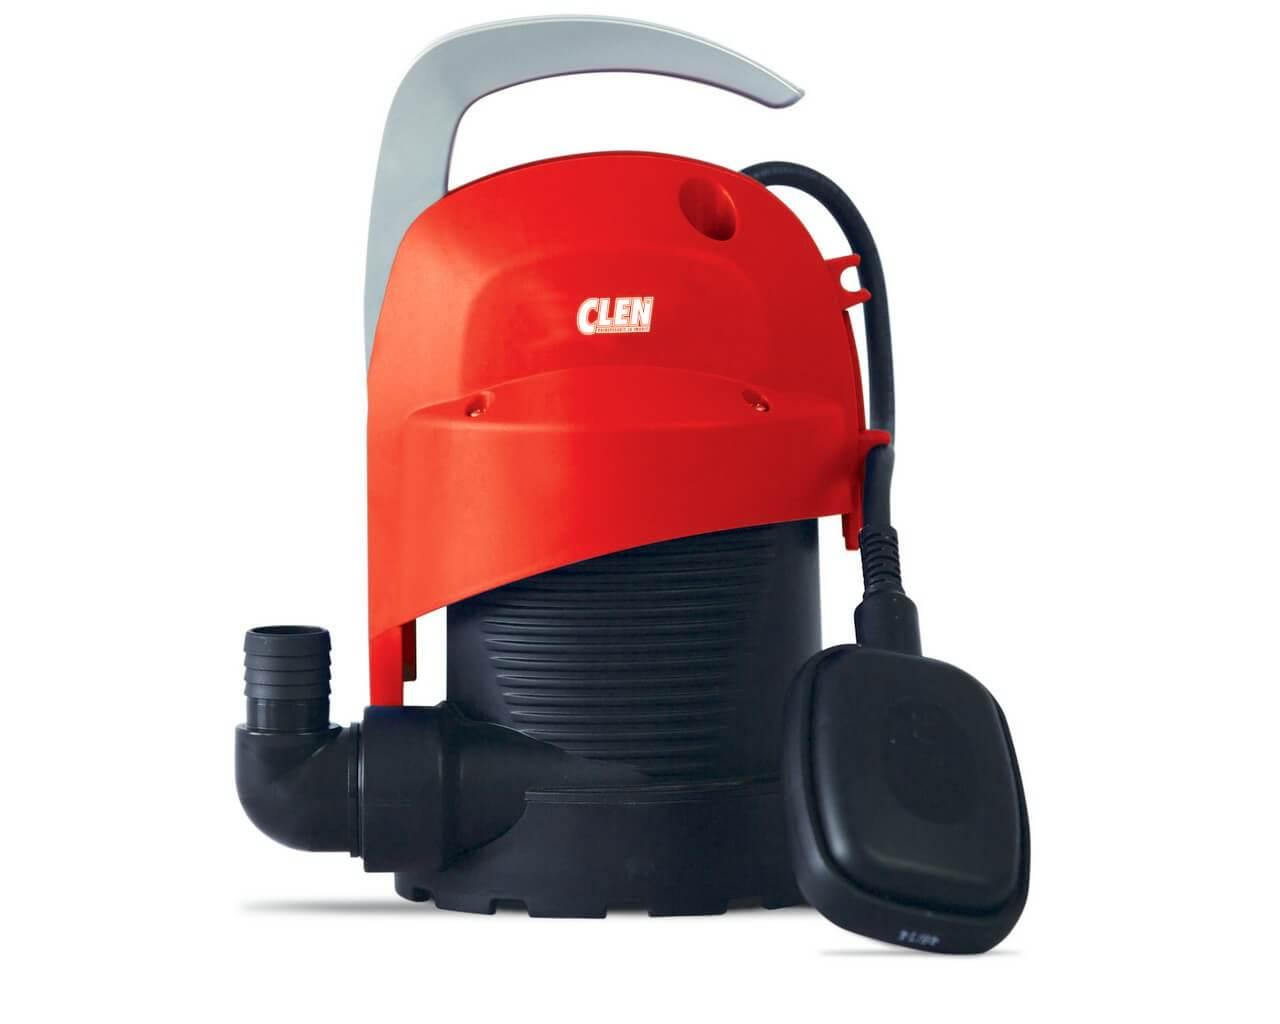 CLEN CW 200 - Kailatec Oy Verkkokauppa